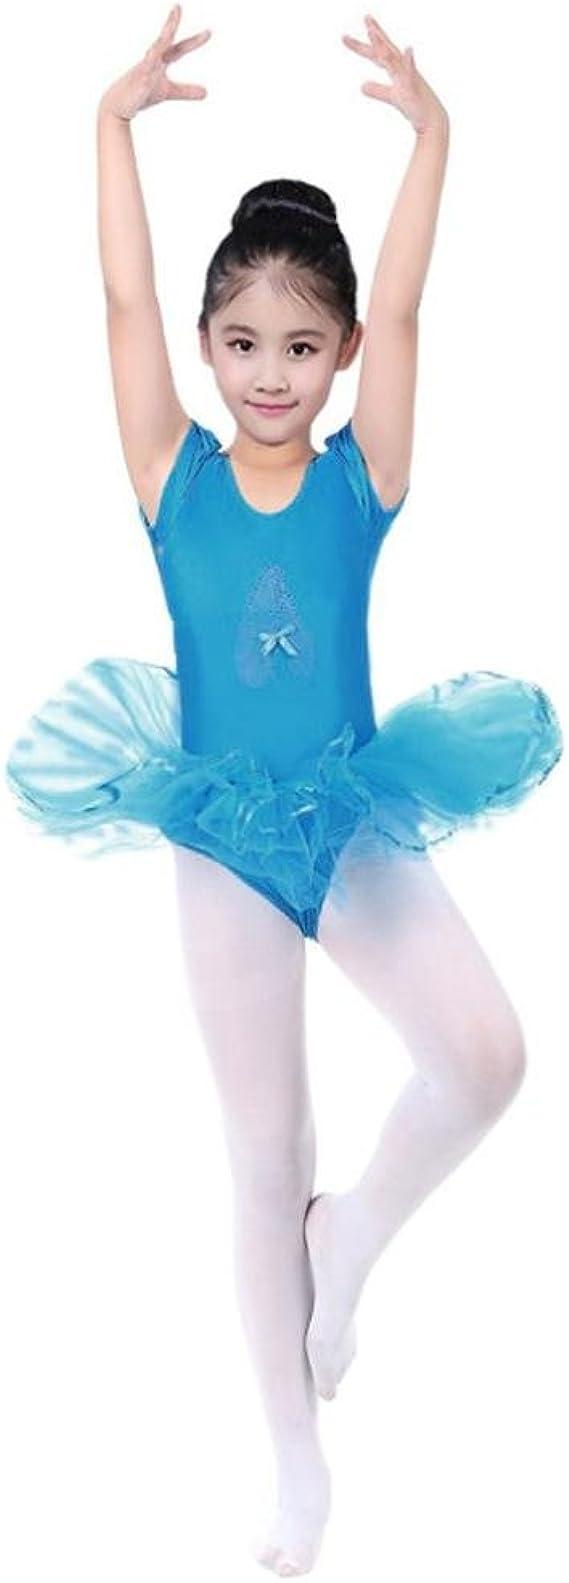 UK Kids Girls Ballet Dress Leotard+Tutu Skirt Gymnastic Dancewear Outfit Costume